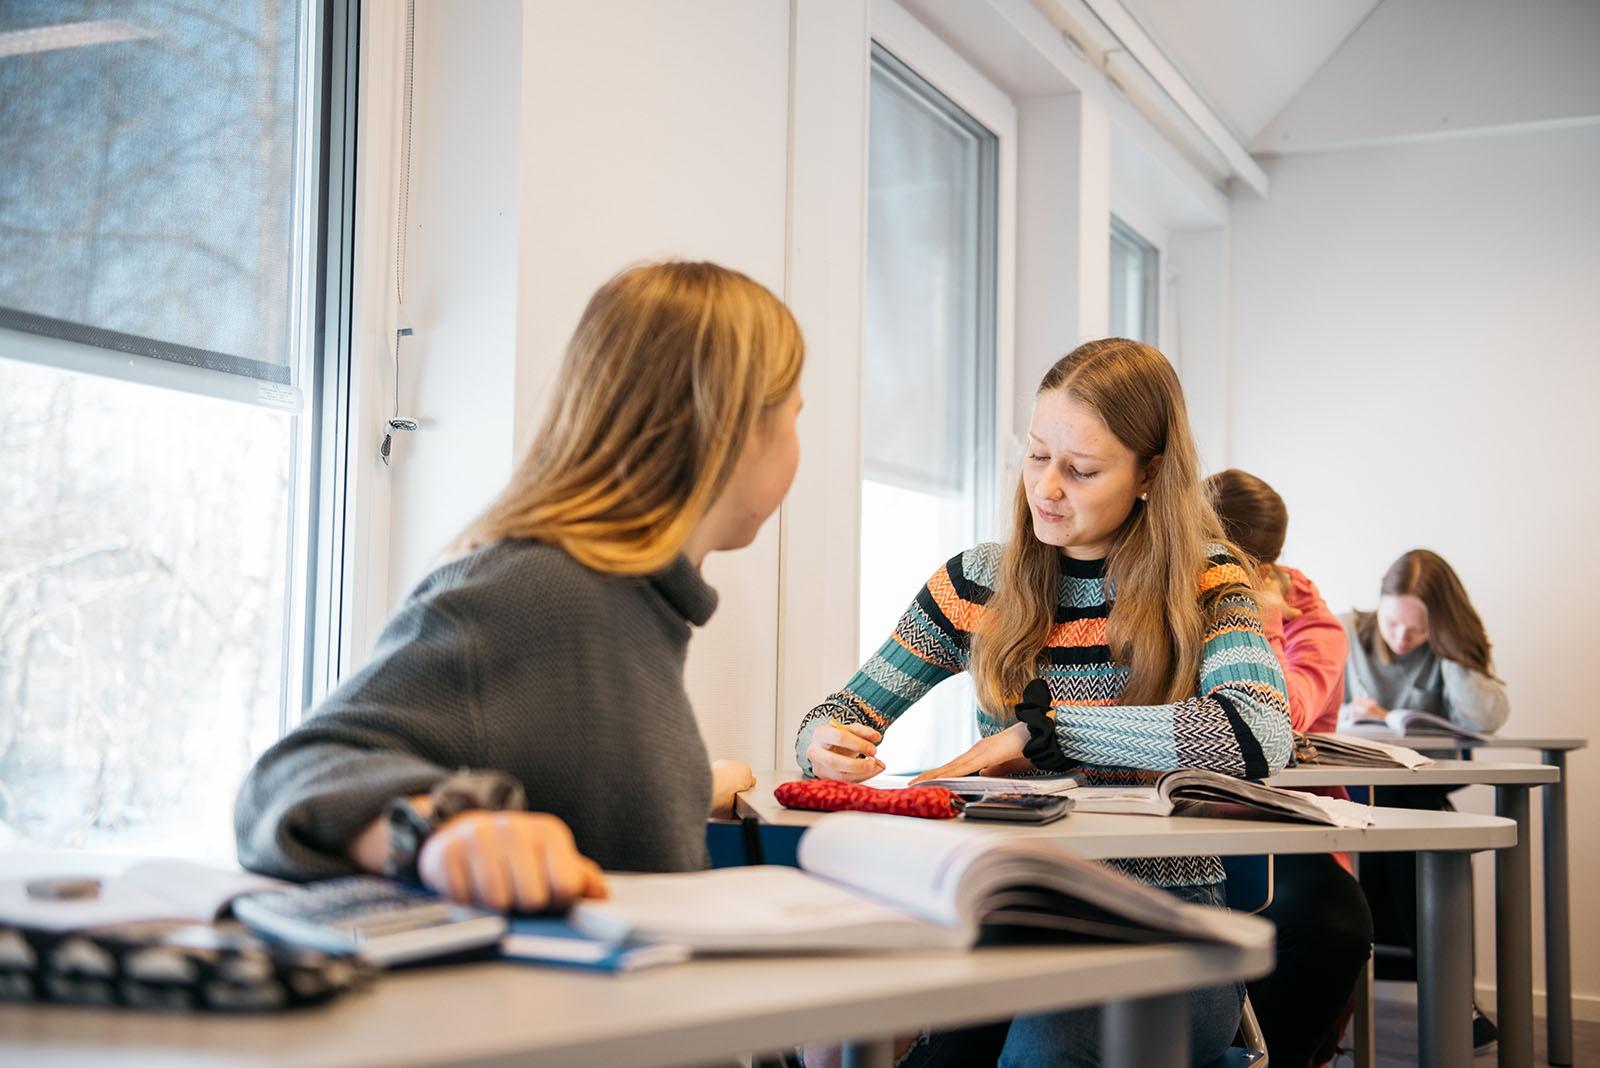 School-Siilinjarvi-Finland-C90-2019-4_1600